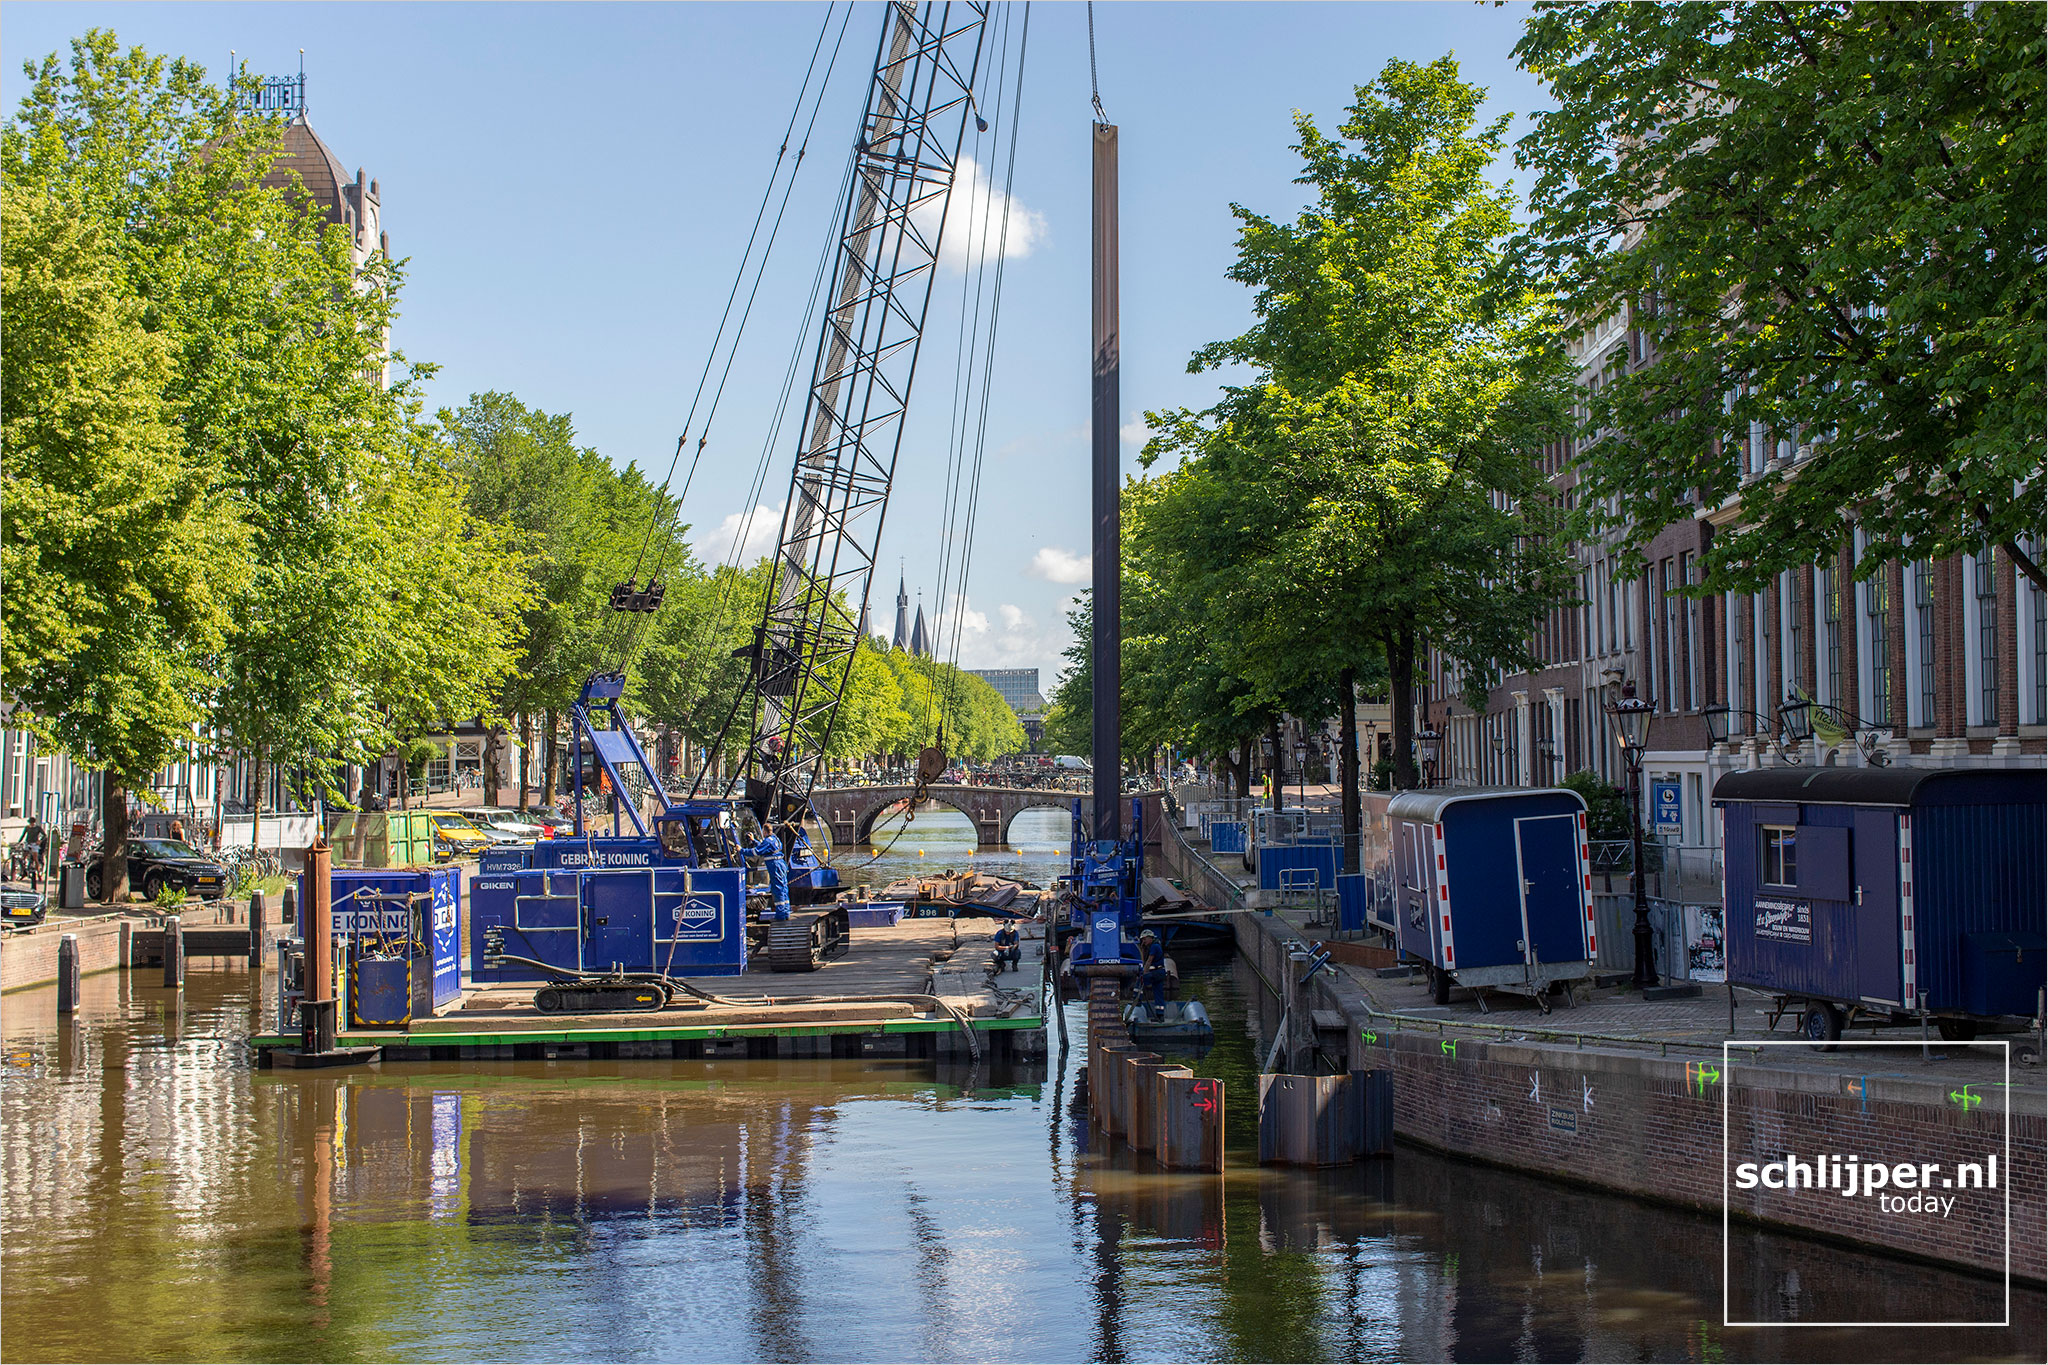 Nederland, Amsterdam, 22 juni 2020